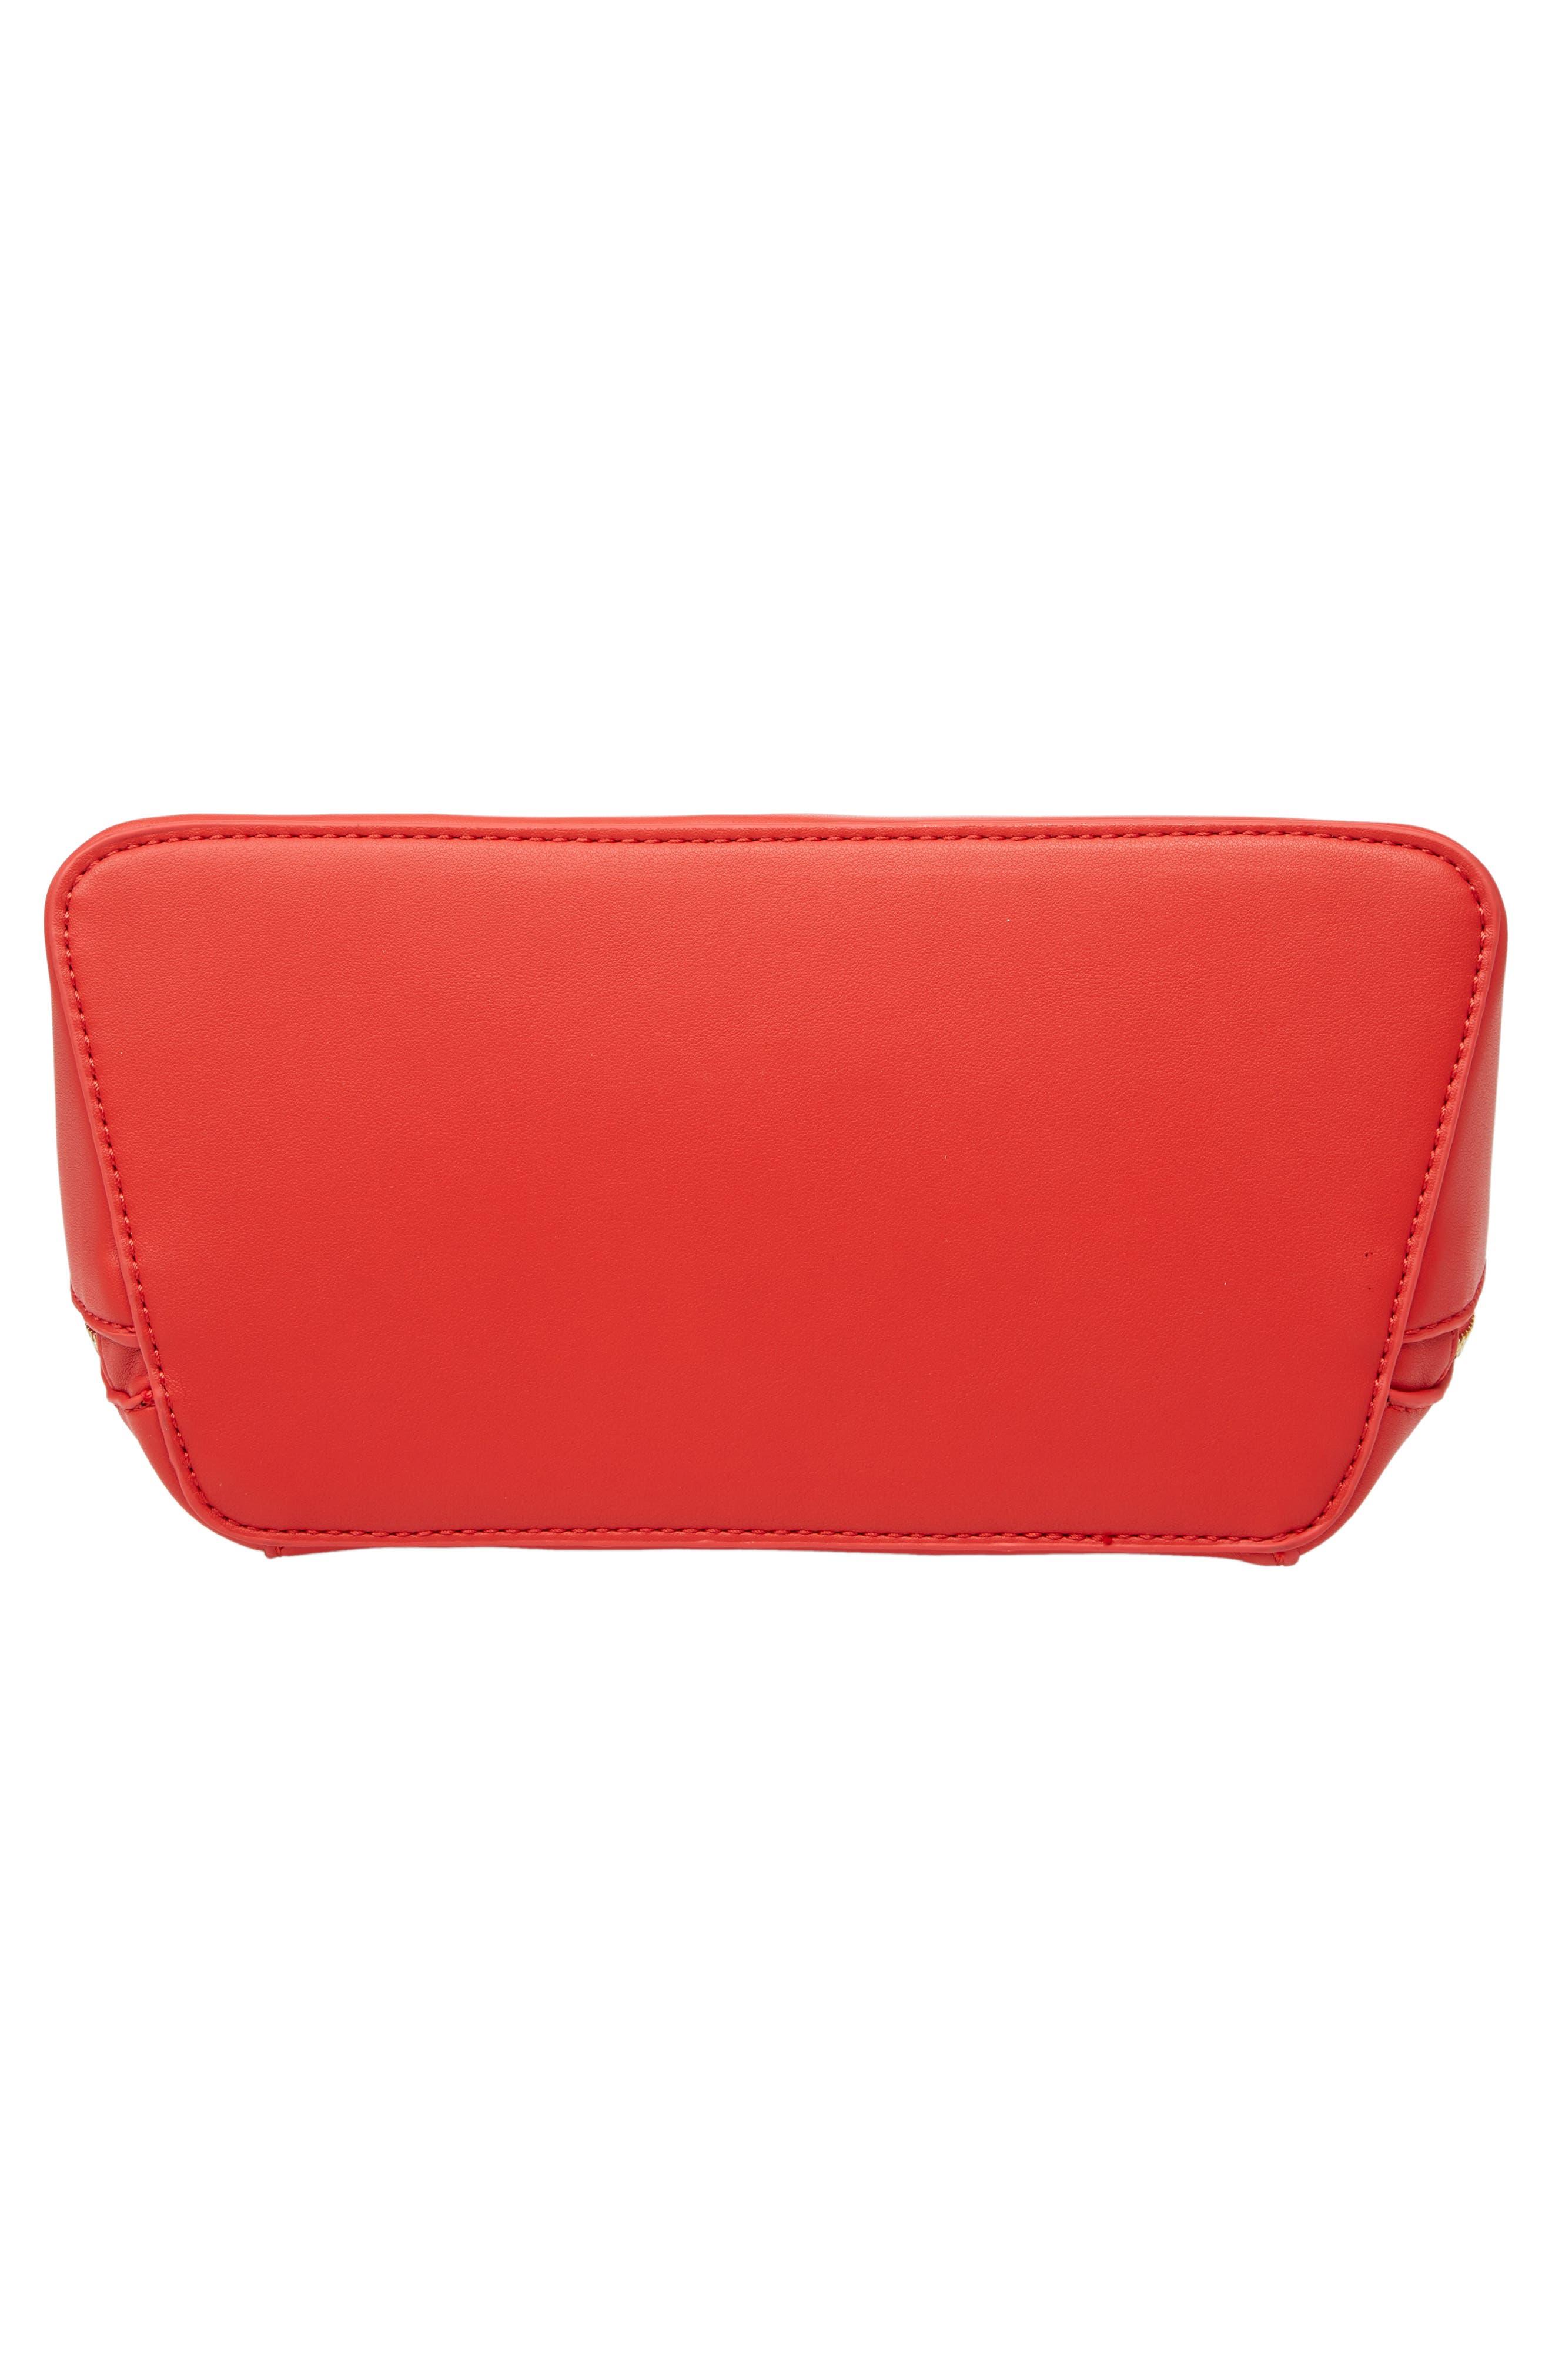 Top Handle Crossbody Bag,                             Alternate thumbnail 5, color,                             Red